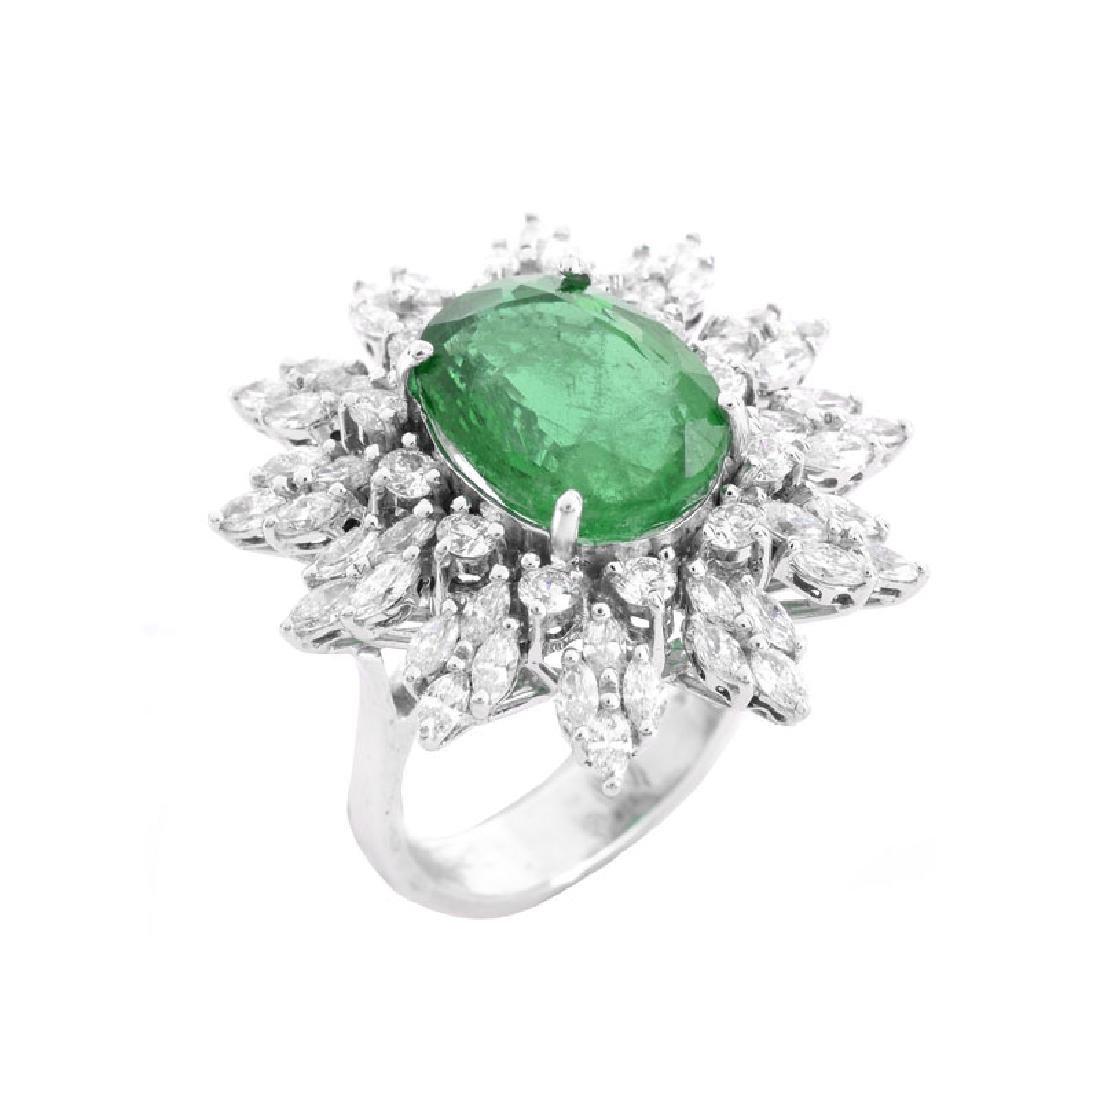 Approx. 5.30 Carat Oval Cut Emerald, 1.95 Carat TW